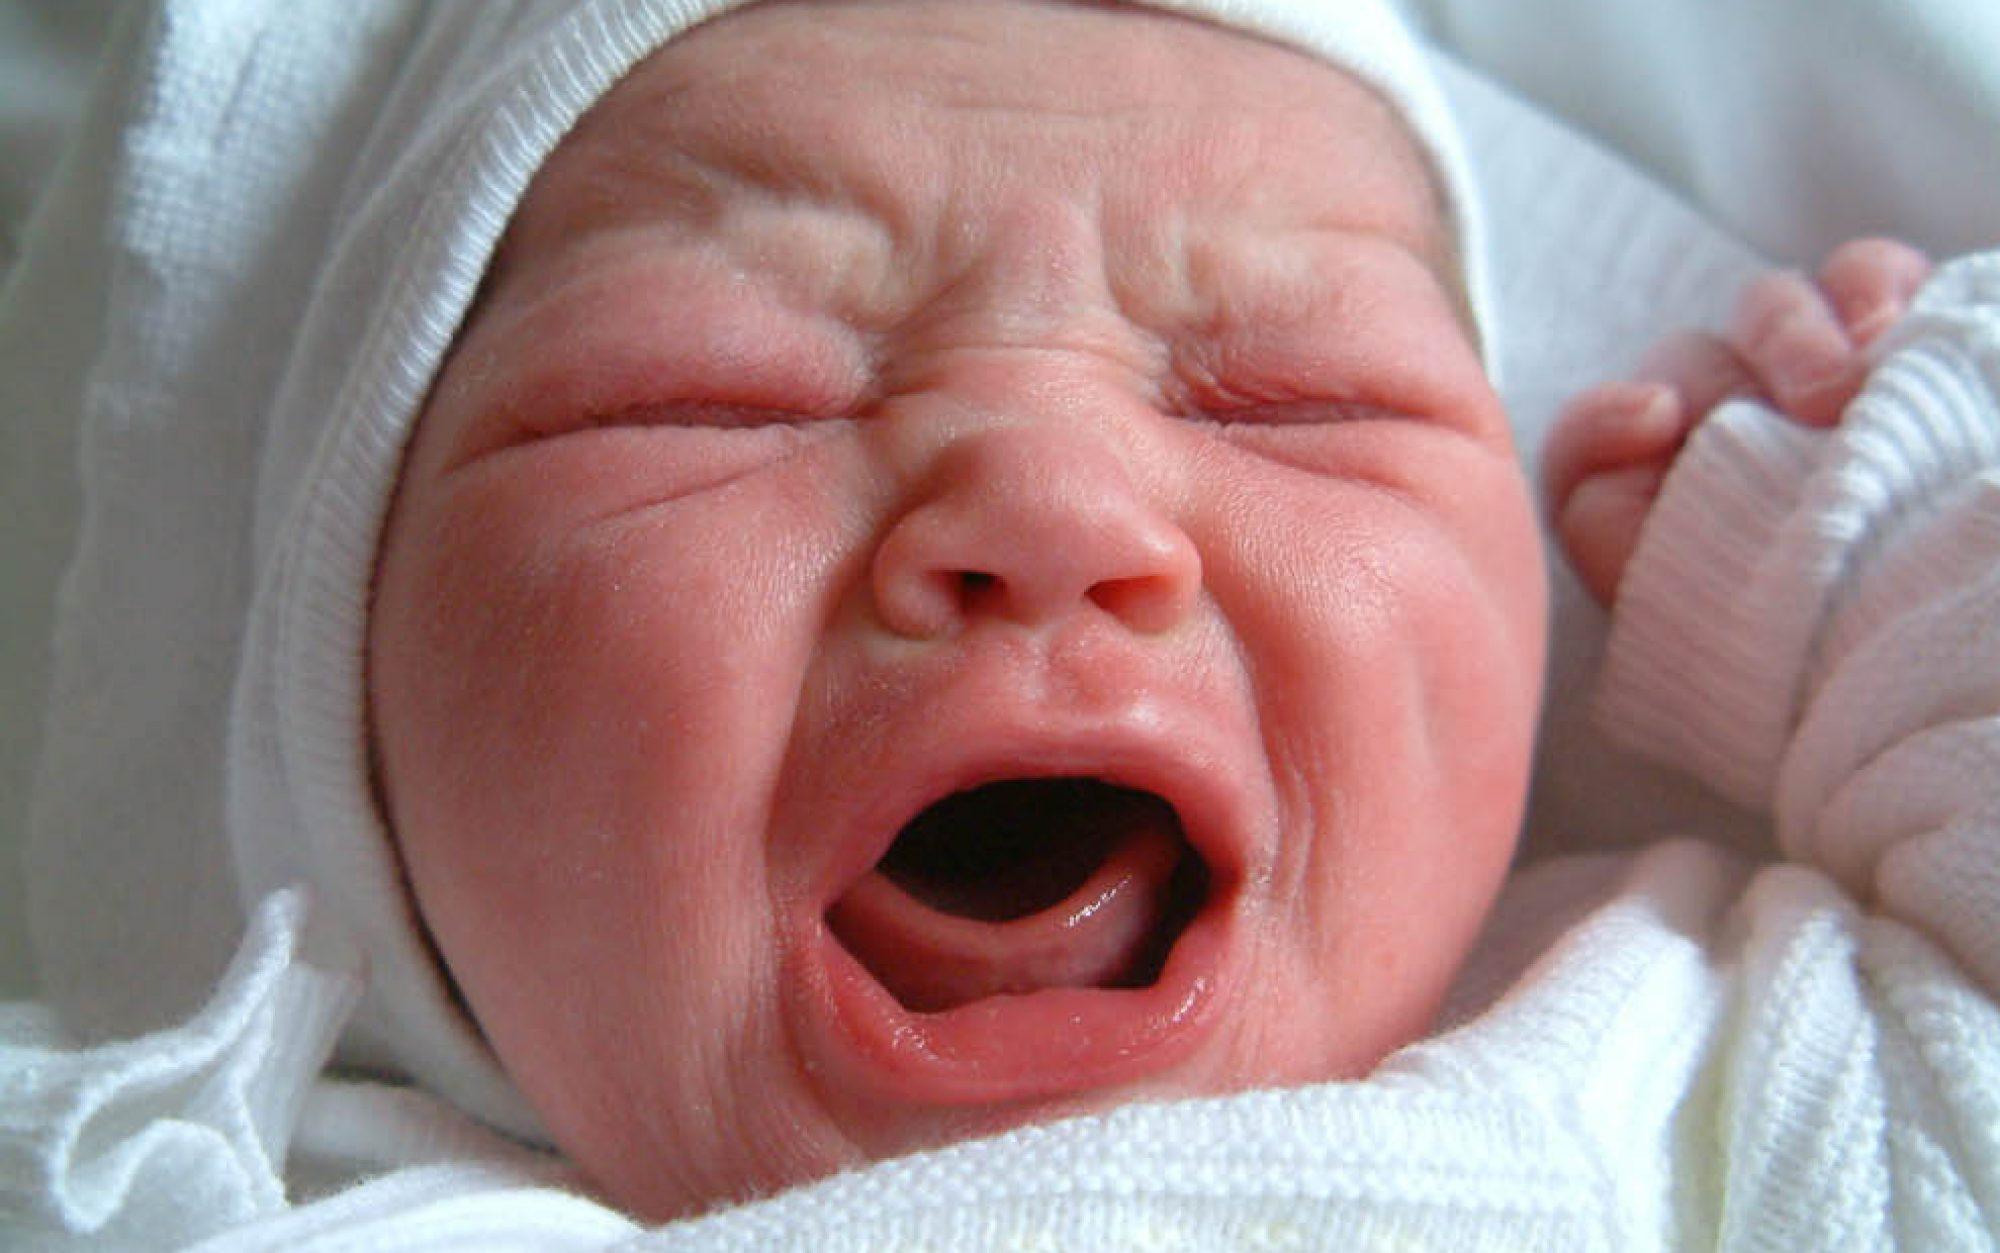 Arbeitskreis Säuglings-Kleinkind-Eltern-Psychotherapie